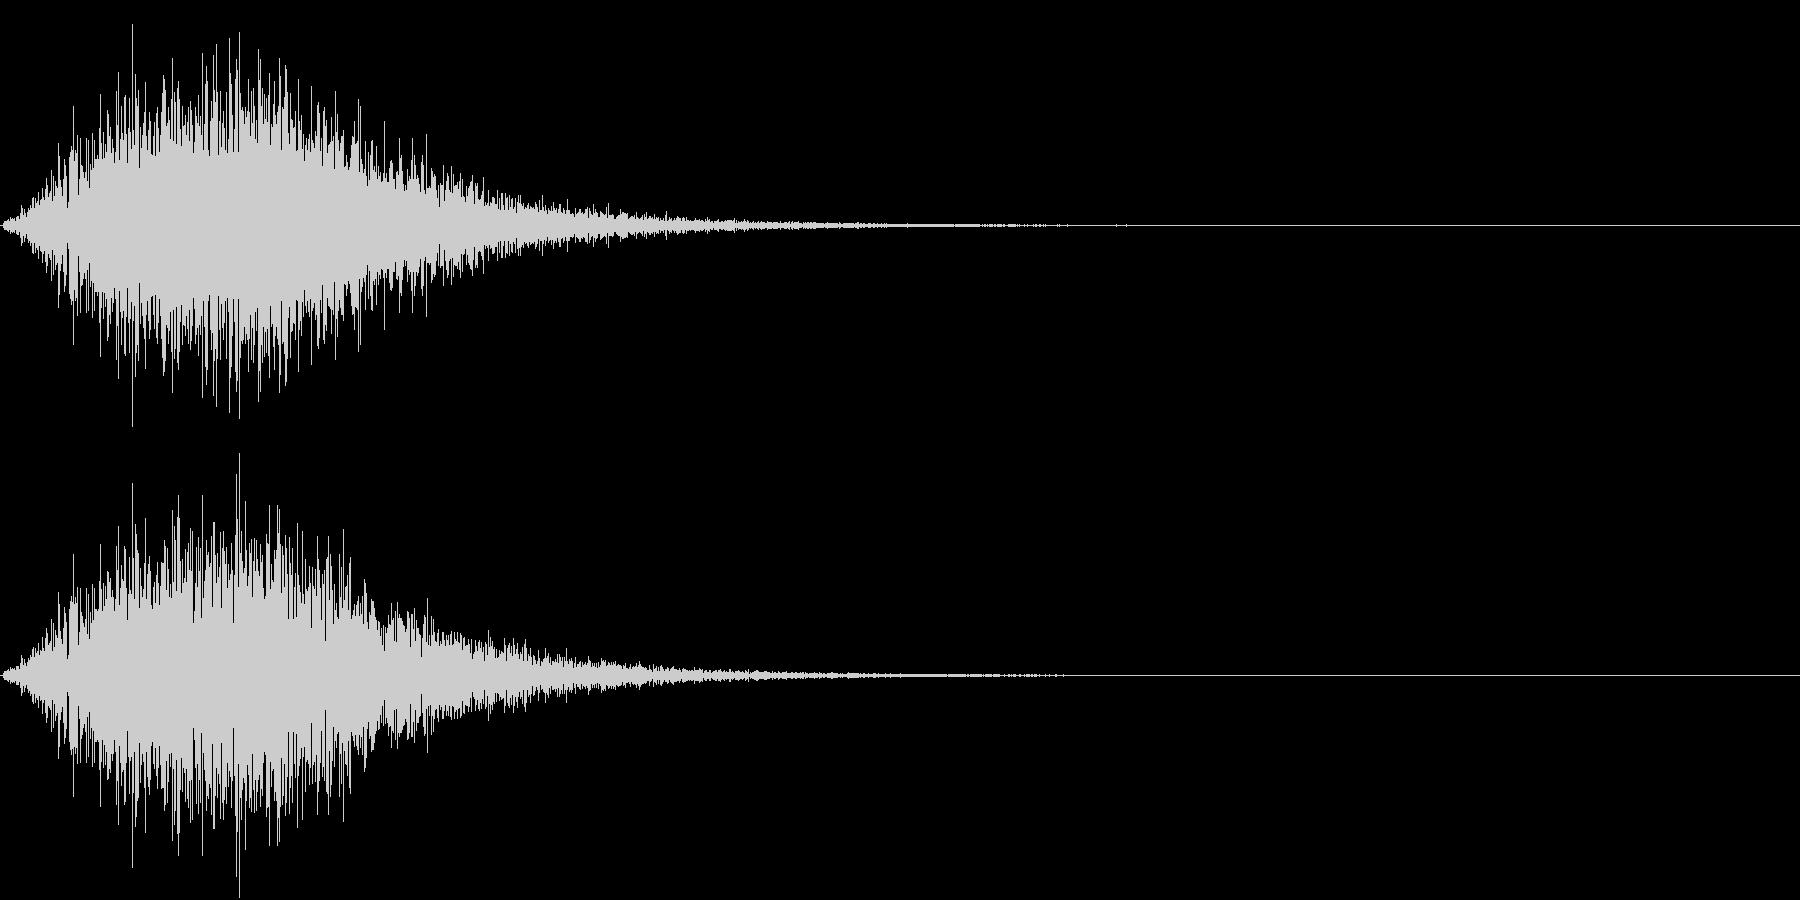 Battle 戦闘エフェクト音 11の未再生の波形